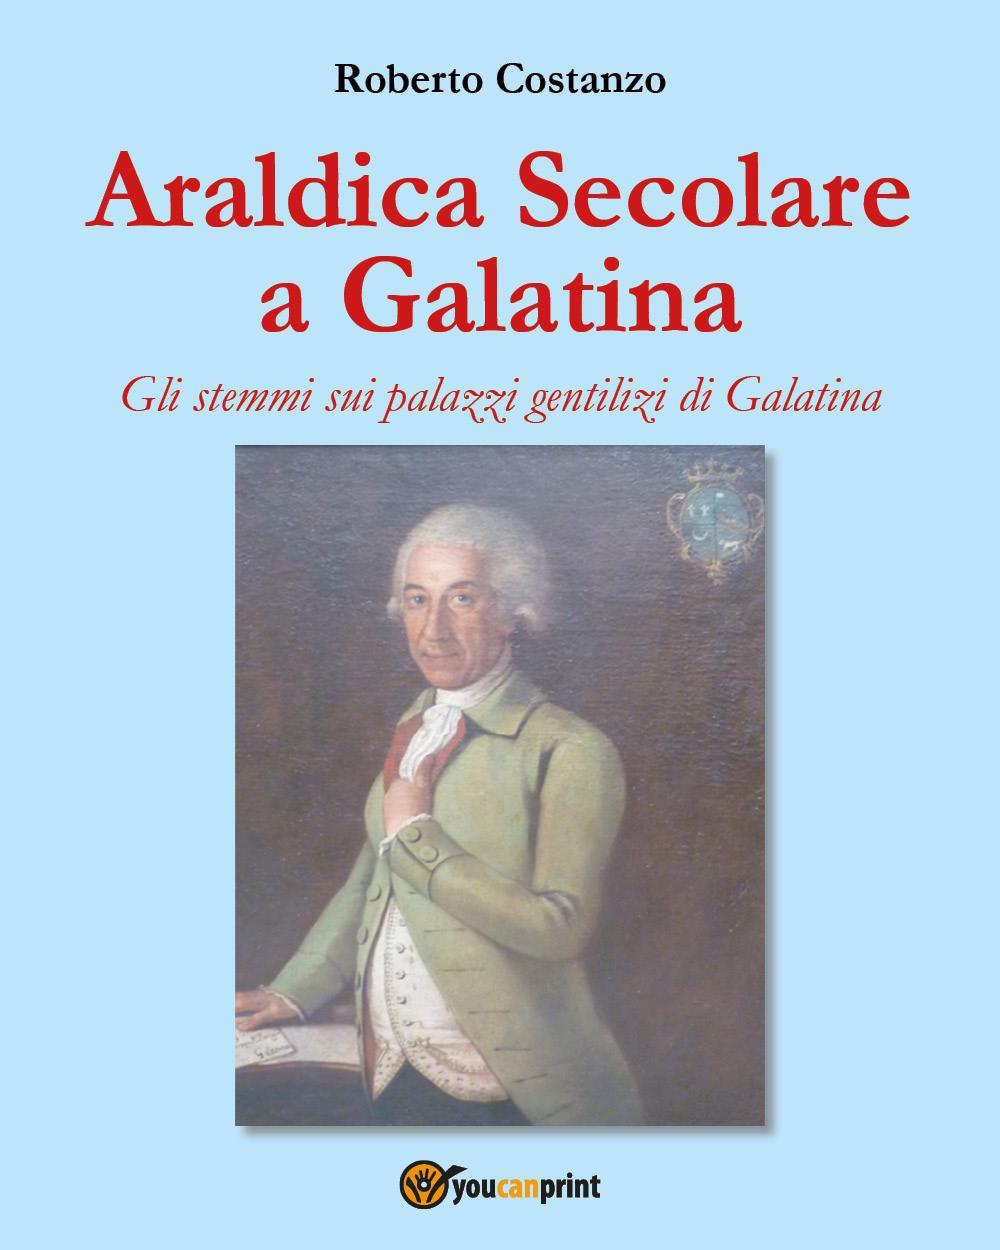 Araldica Secolare a Galatina